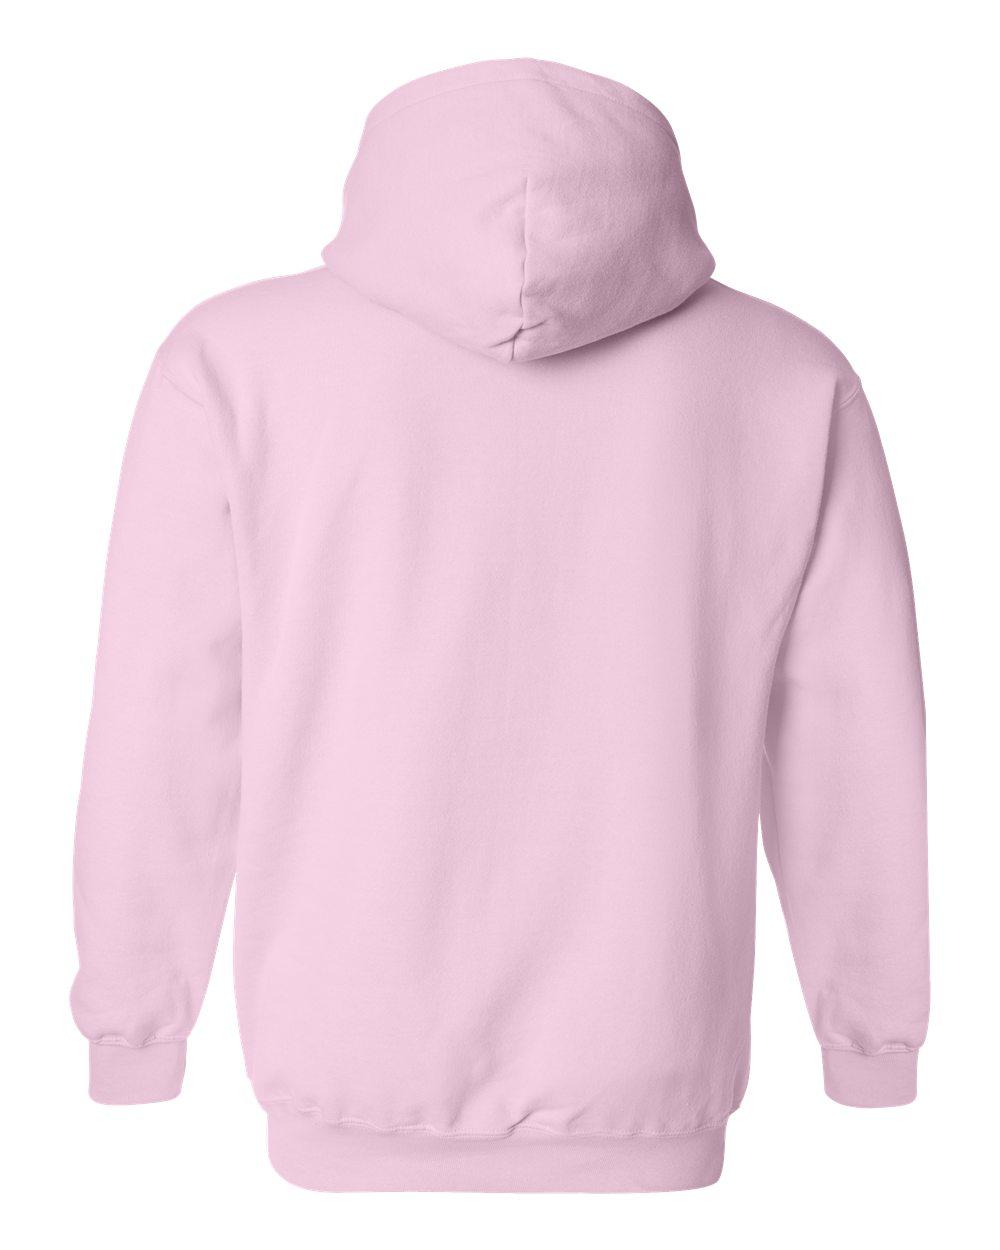 Gildan-Mens-Blank-Hoodie-Heavy-Blend-Hooded-Sweatshirt-Solid-18500-up-to-5XL thumbnail 54